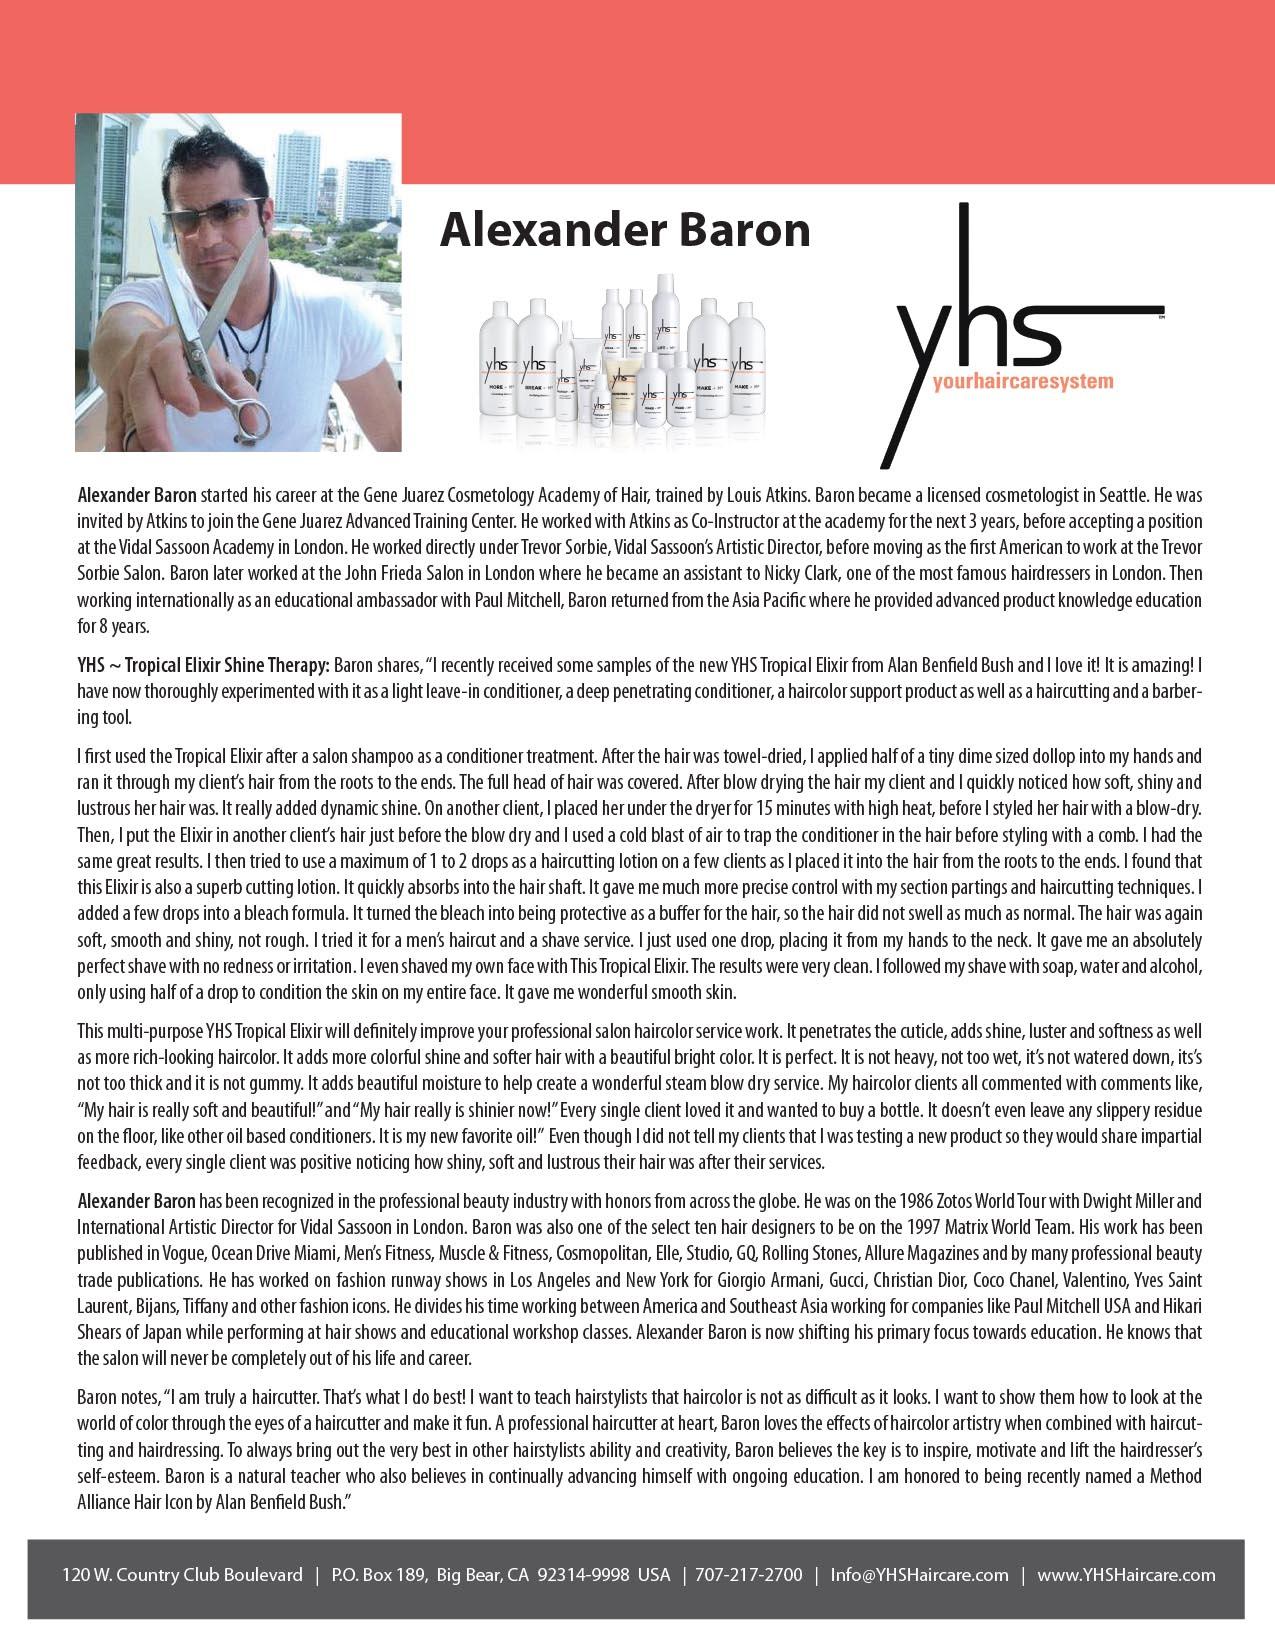 Alexander Baron Testimonial – YHS Haircare